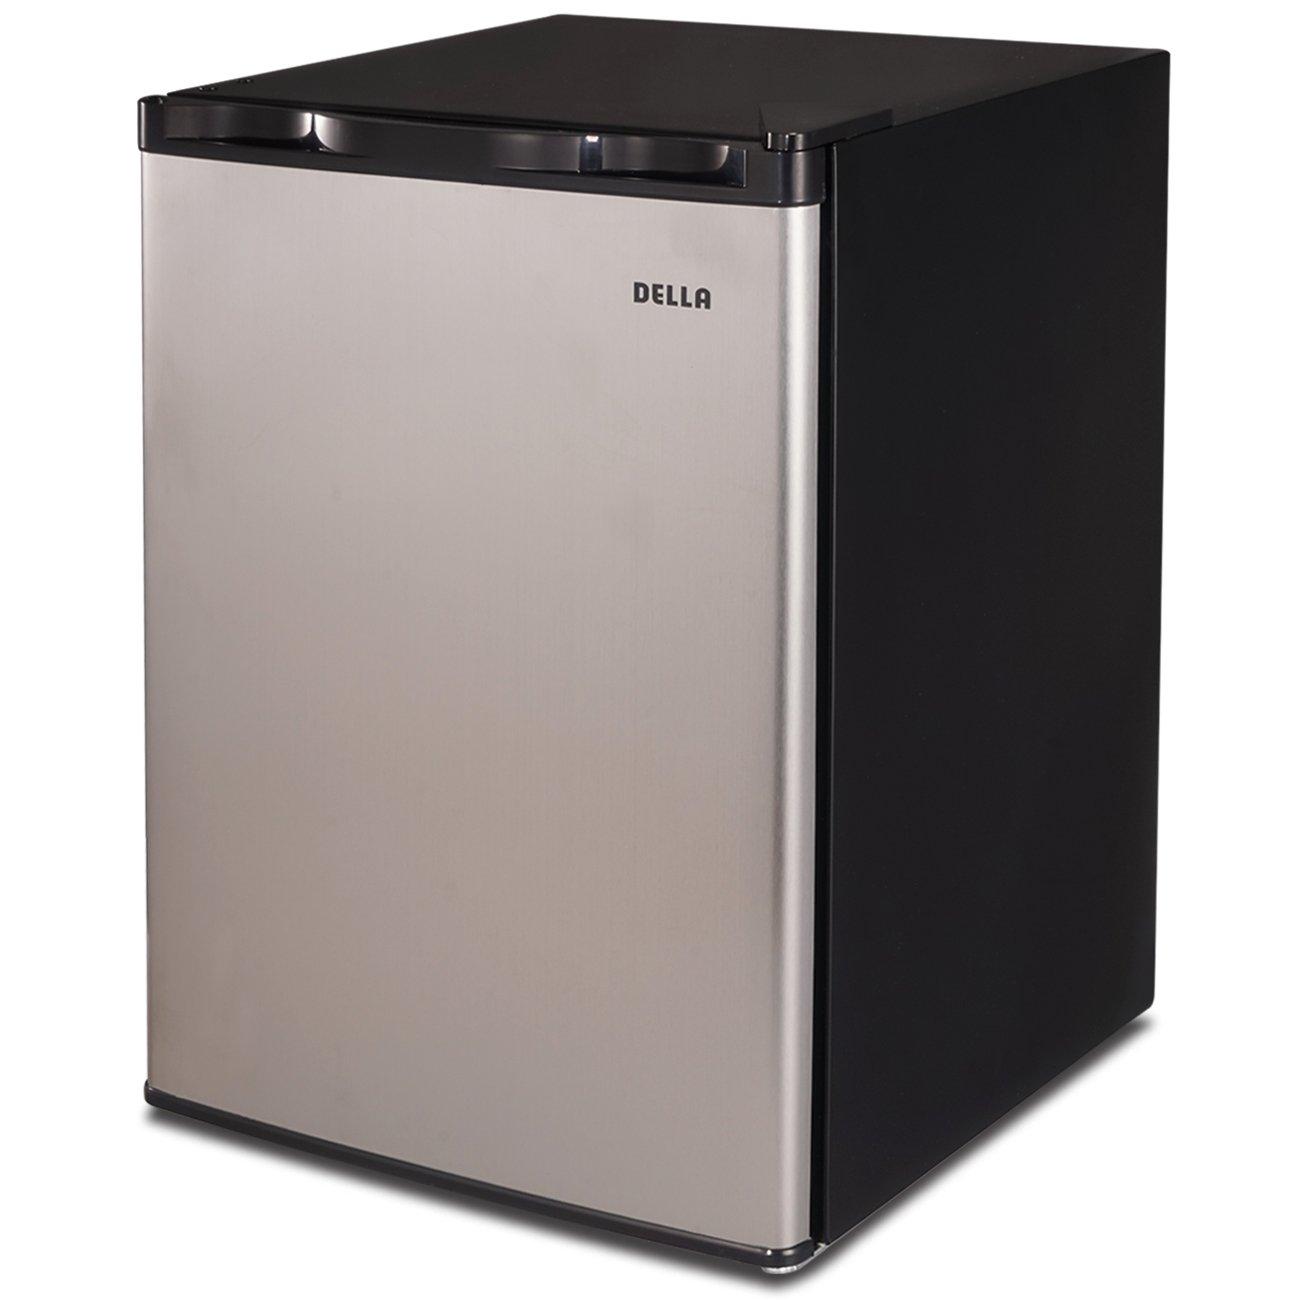 office mini refrigerator. Amazon.com: Della Mini Refrigerator Freezer Dorm Fridge 2.6 Cu Ft Office Compact Room Beer Cooler, Stainless Steel: Appliances R